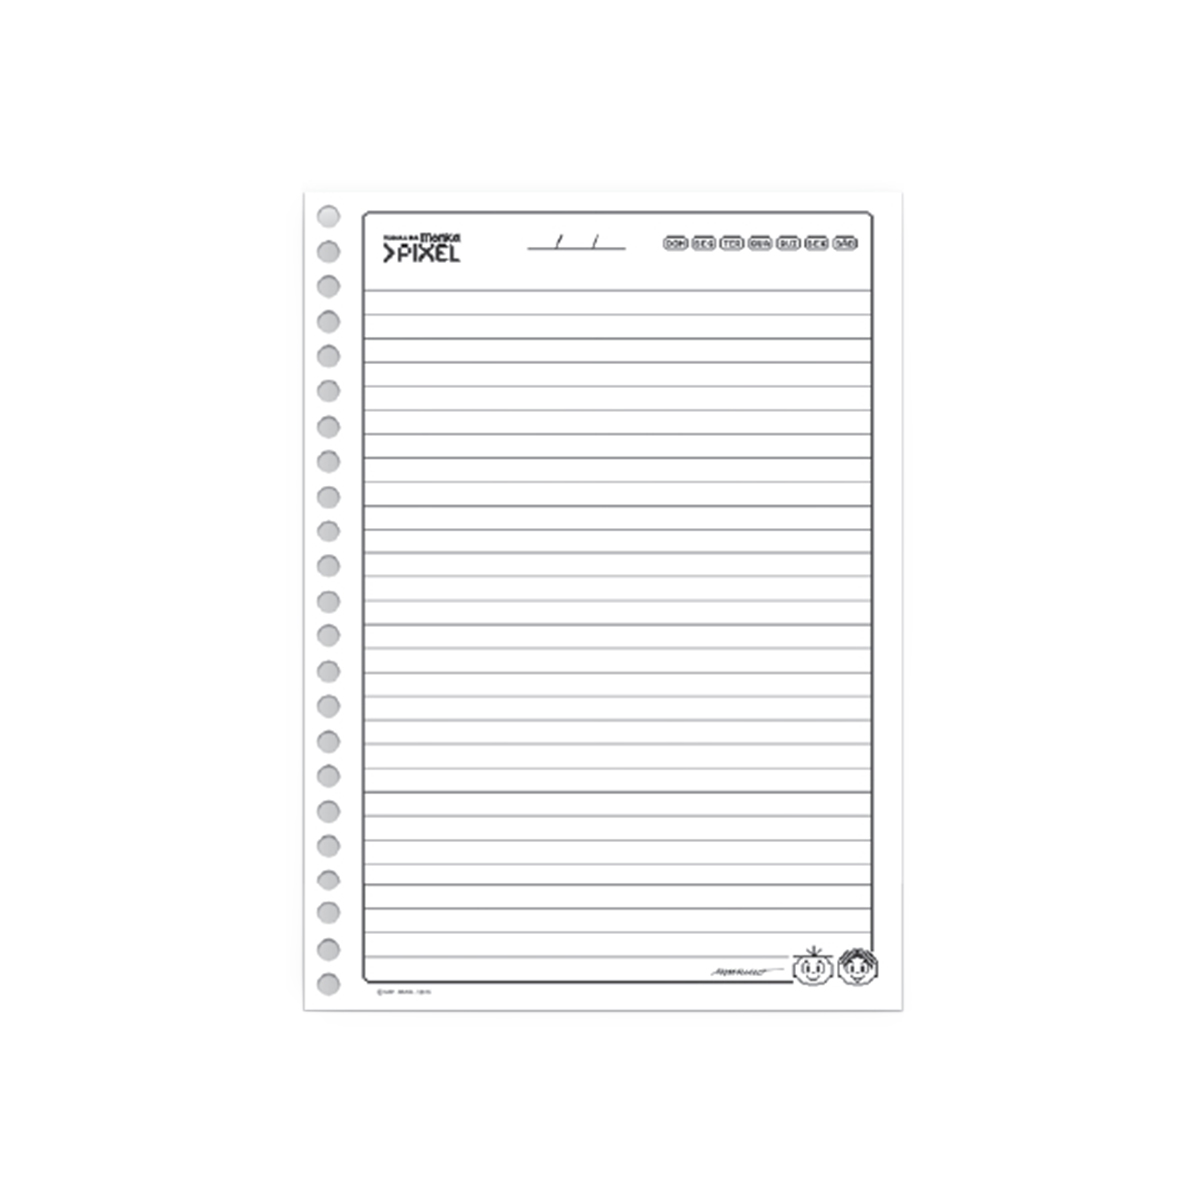 Caderno Turma da Mônica Pixel Mônica 1 Matéria